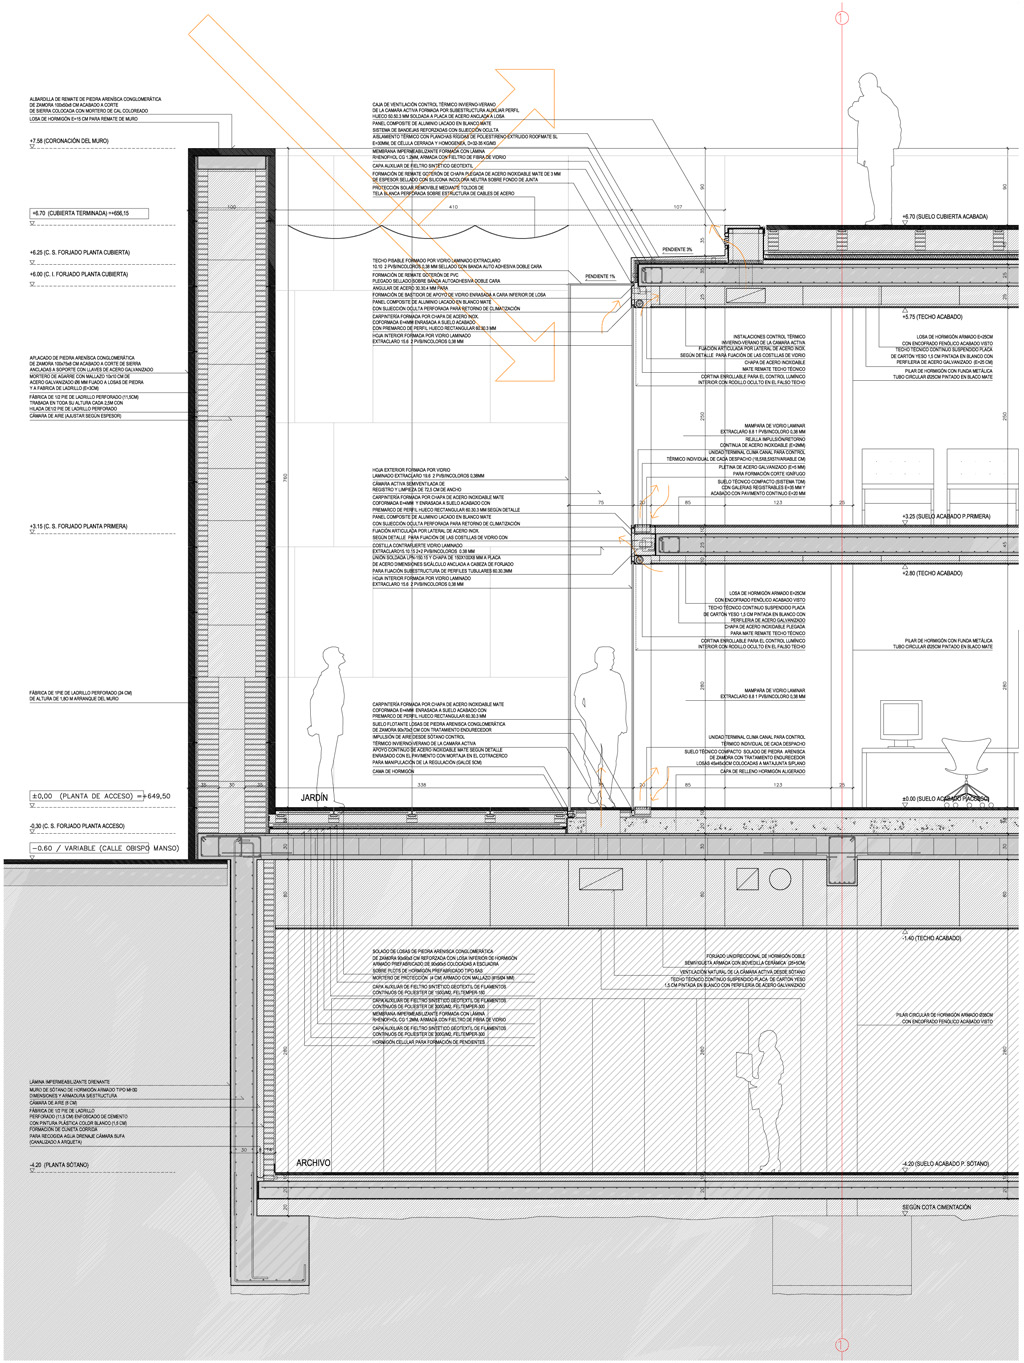 Hecho de aire alberto campo plan arquitectura campo - Arquitectos en zamora ...